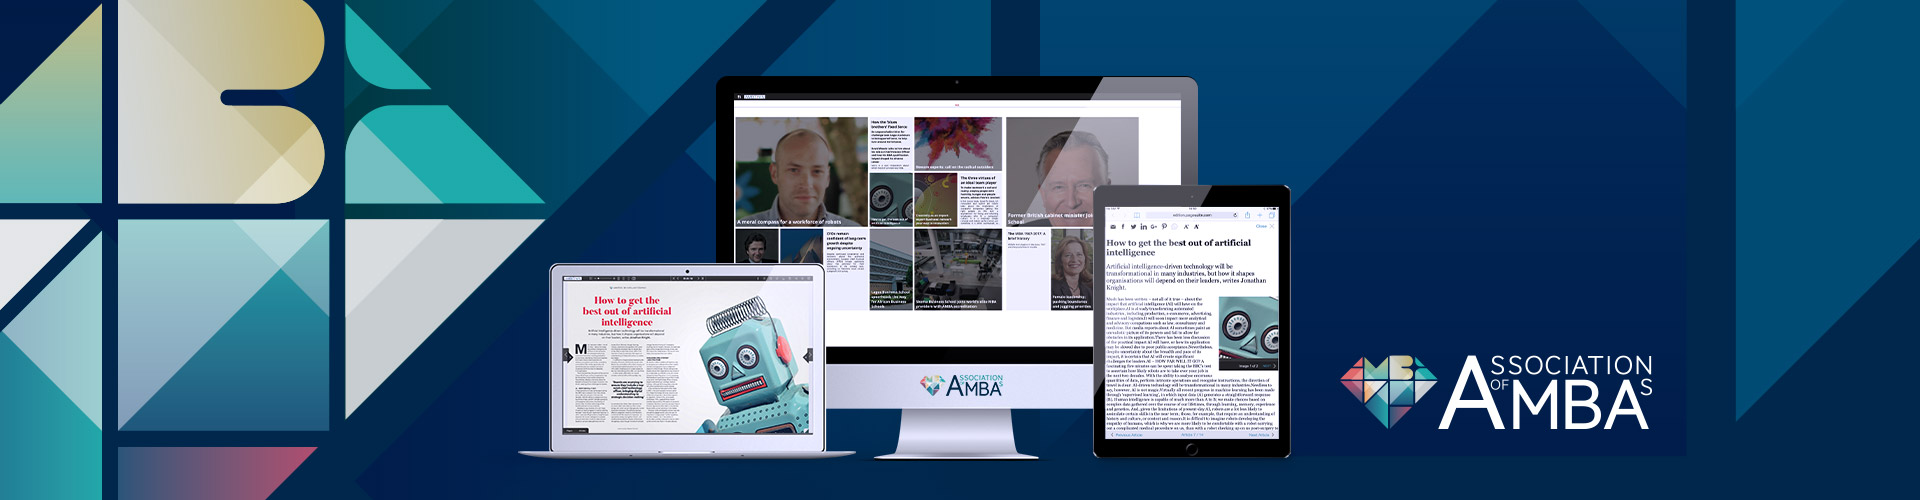 AMBA Wins Best Digital Publication Award